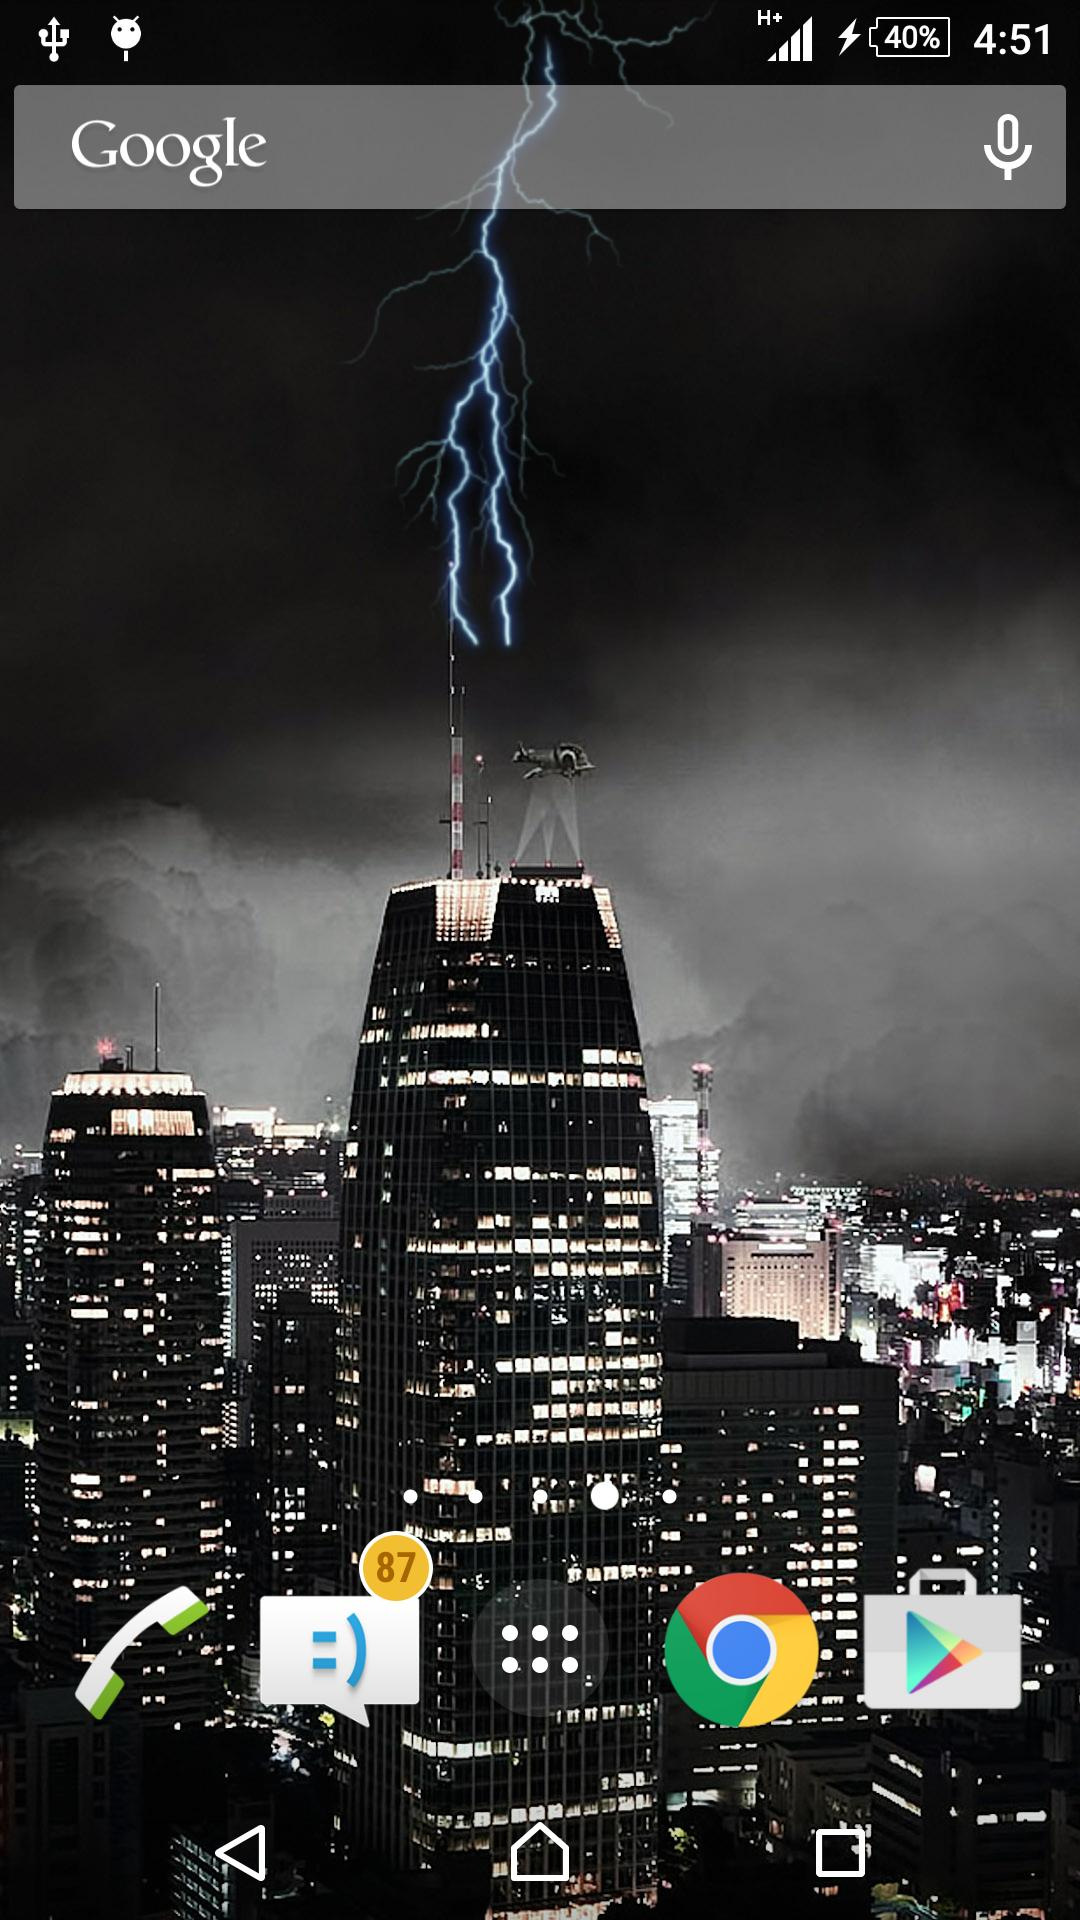 Lightning Storm Live Wallpaper Bolt Wallpaper For Android